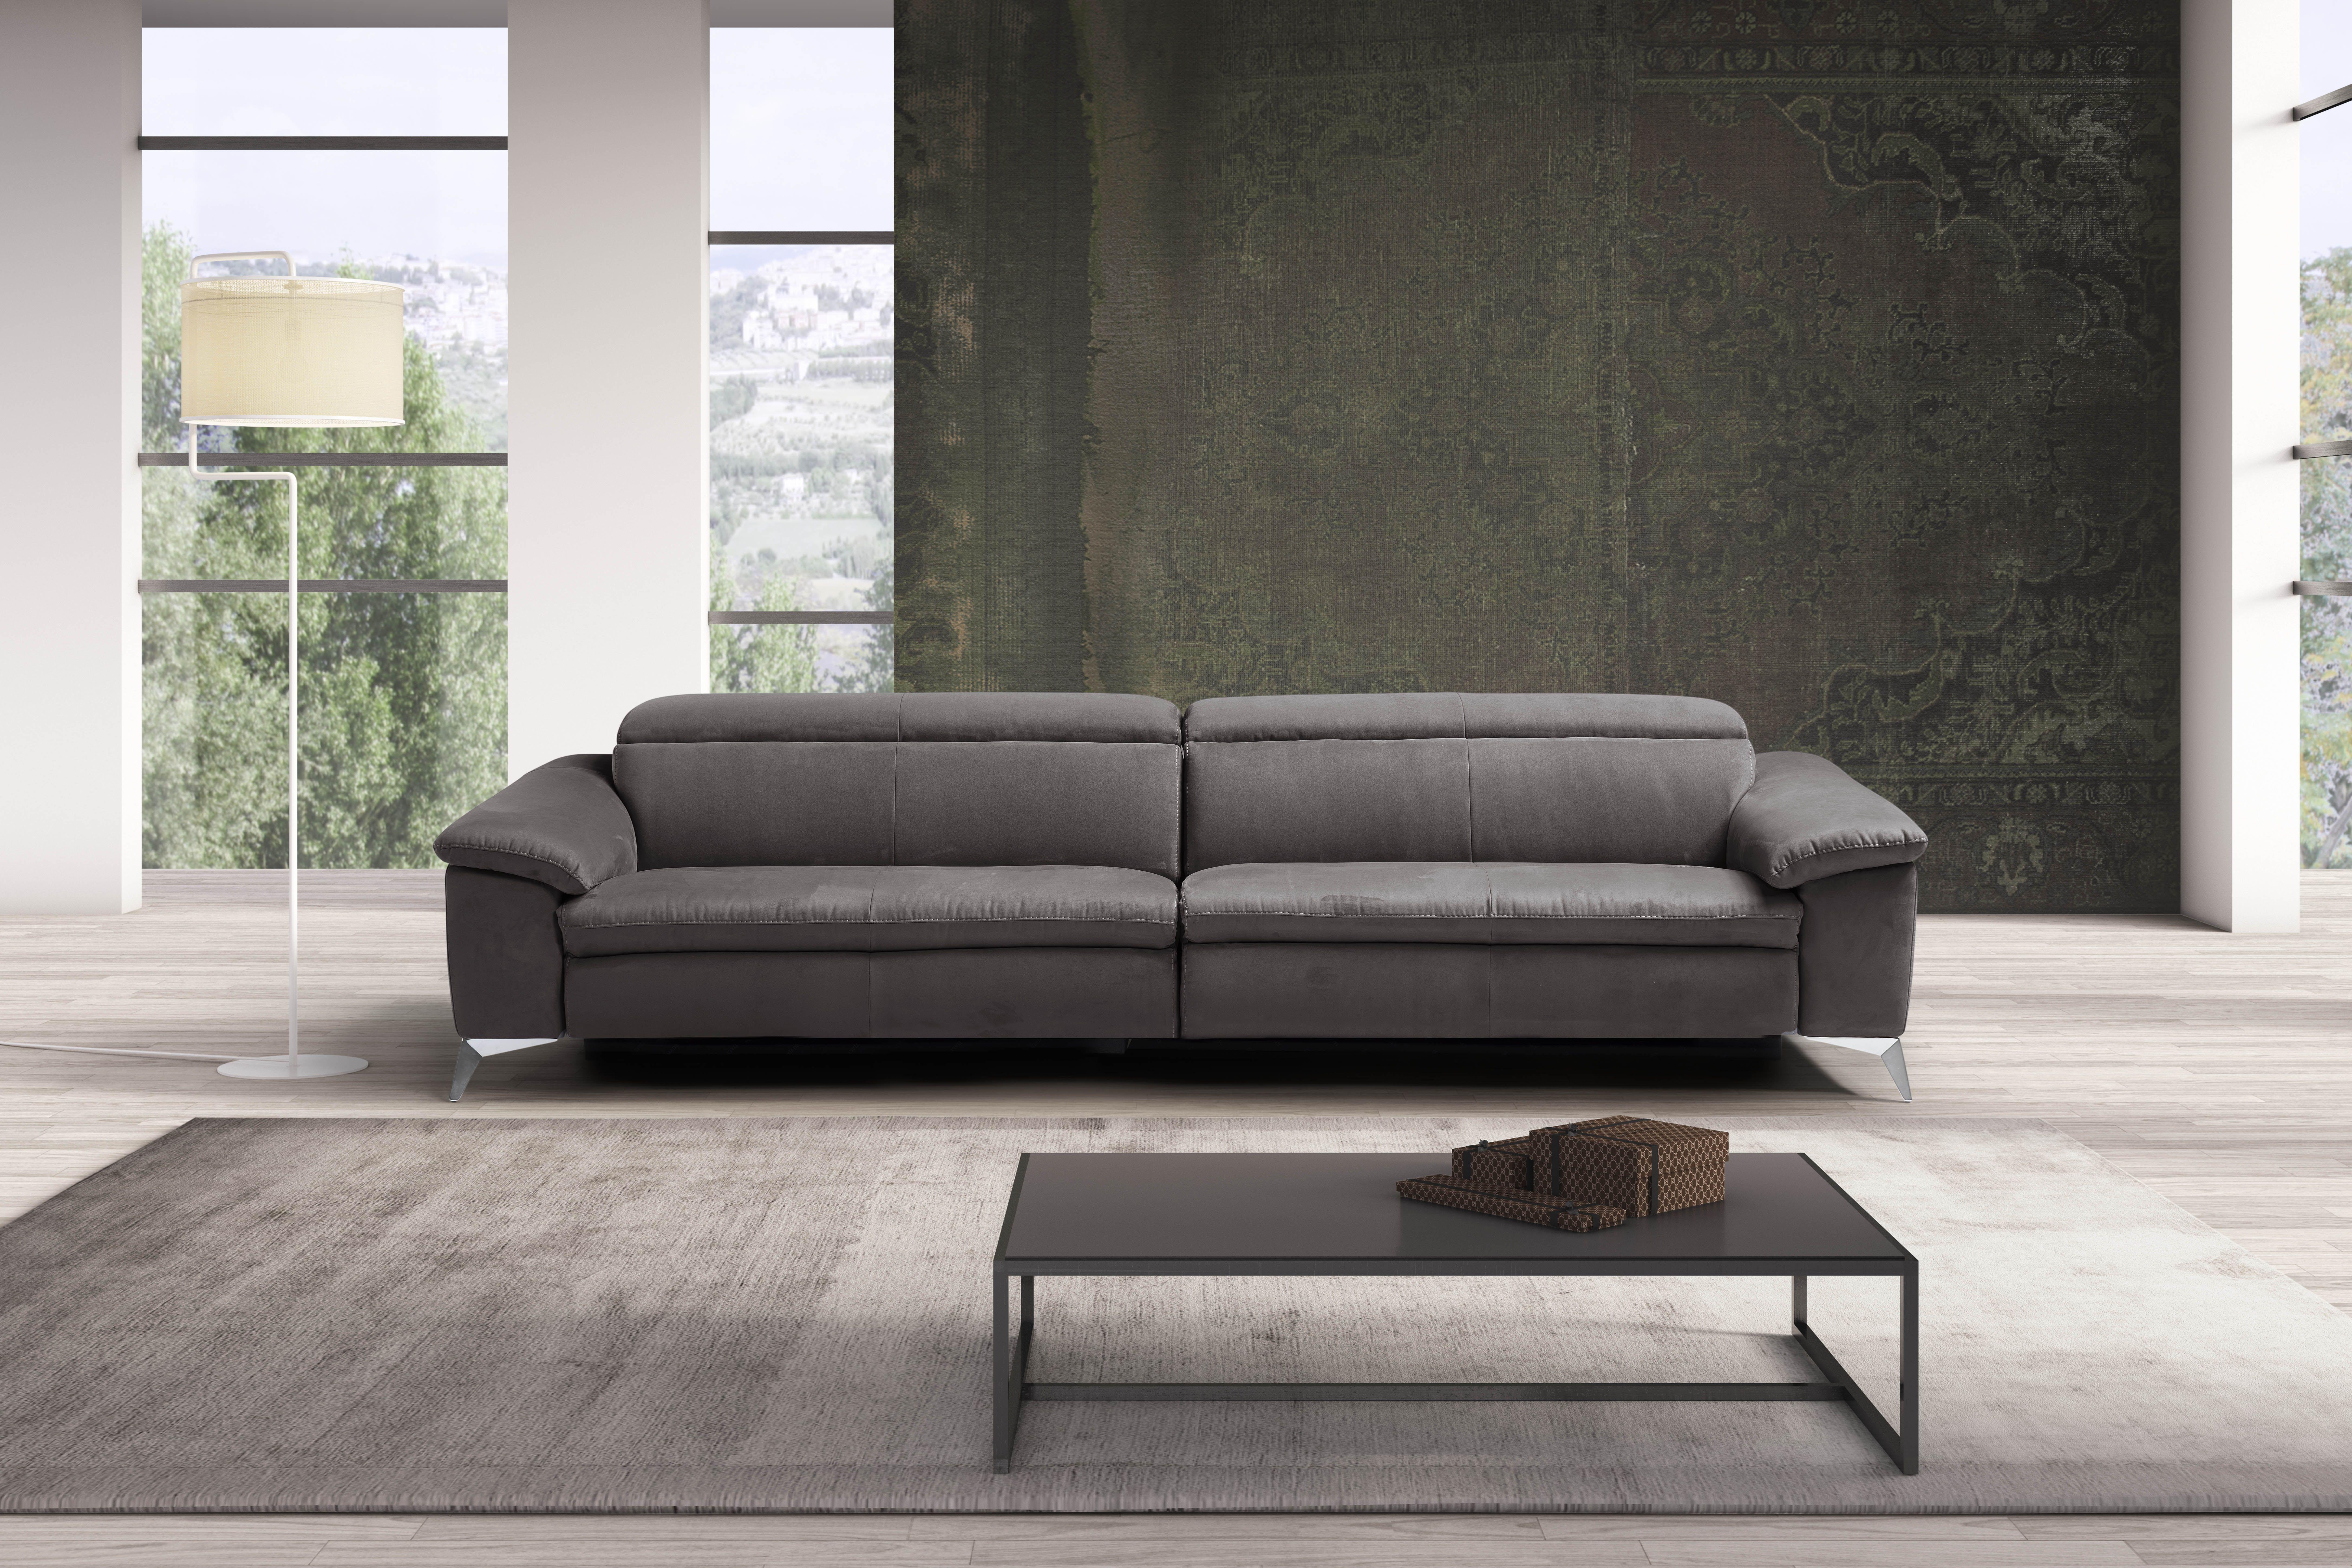 Ecointeriors Ecoexclusive Egoitaliano Couch Italian Design Dublin Santry Dunlaoghaire Design Couch Kitchen Design